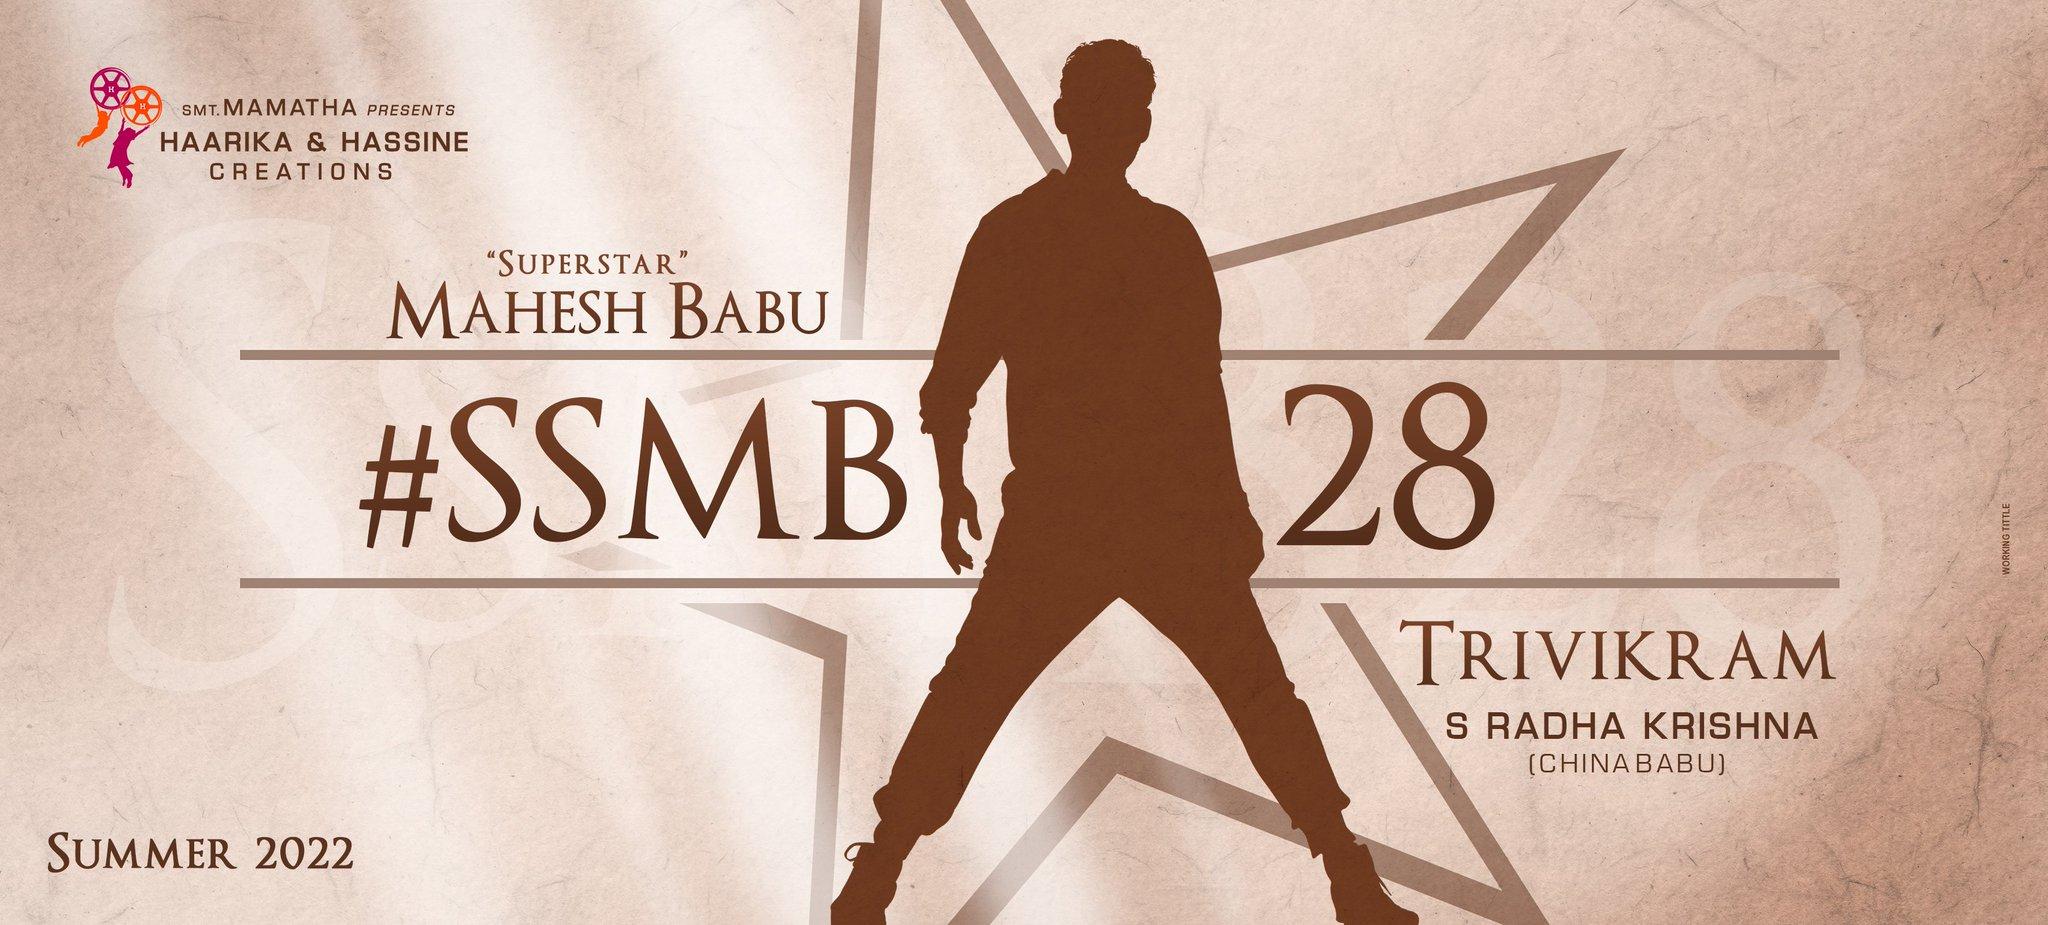 Mahesh Babu - Trivikram's SSMB28 title announcement on 31st May?